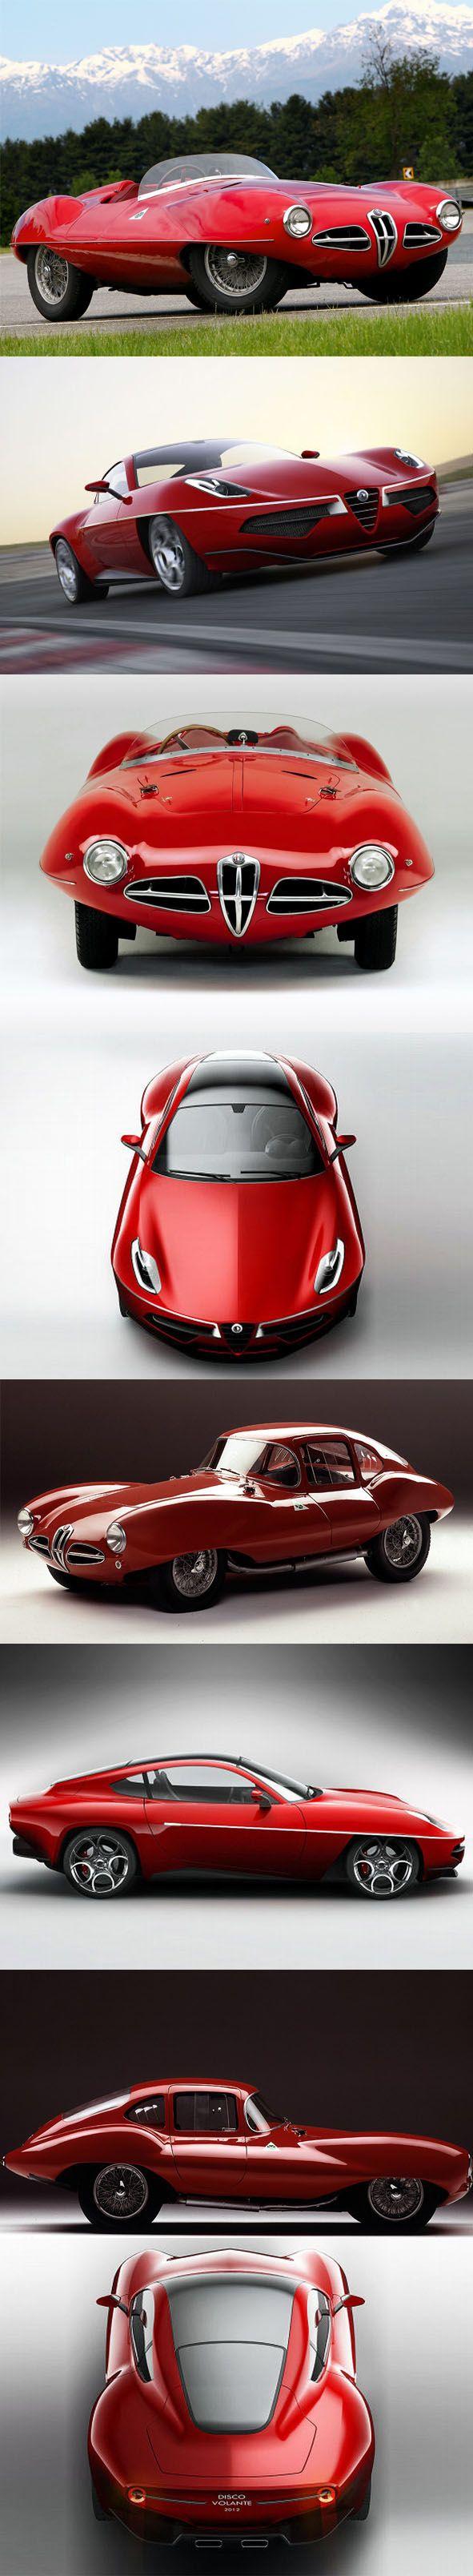 "Alfa Romeo C52 ""Disco Volante"" B"